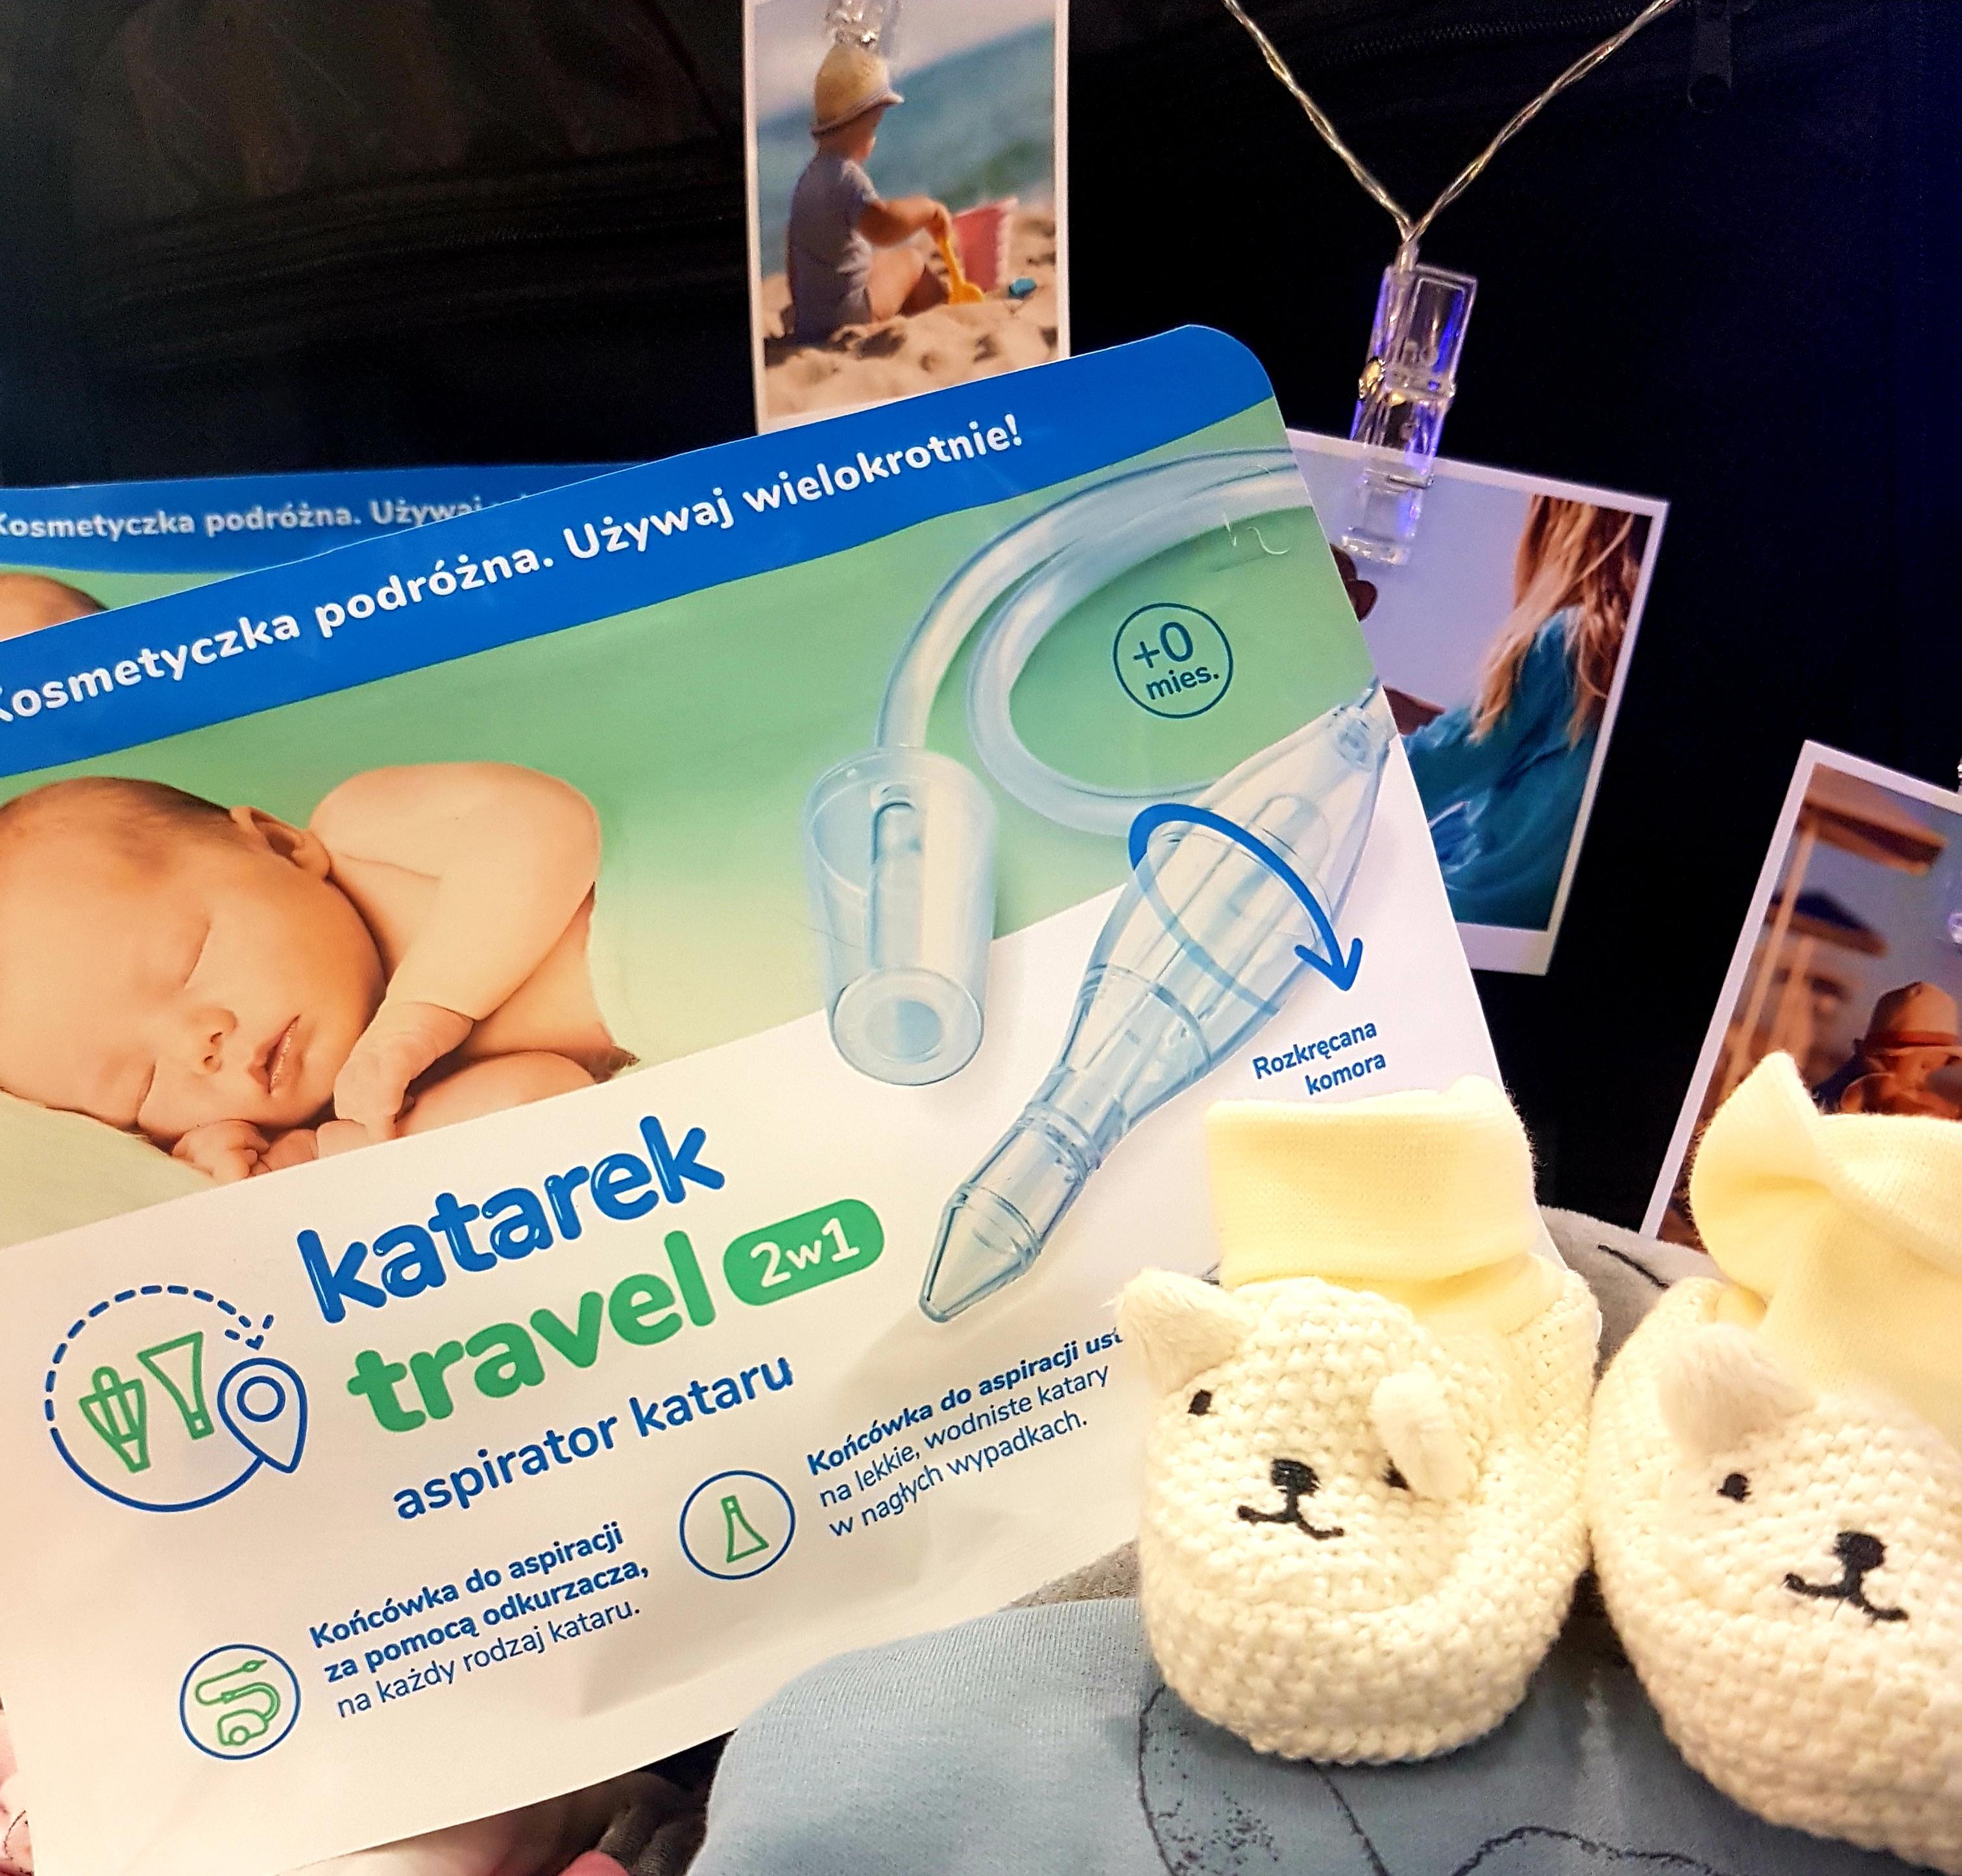 Katarek Travel 2w1